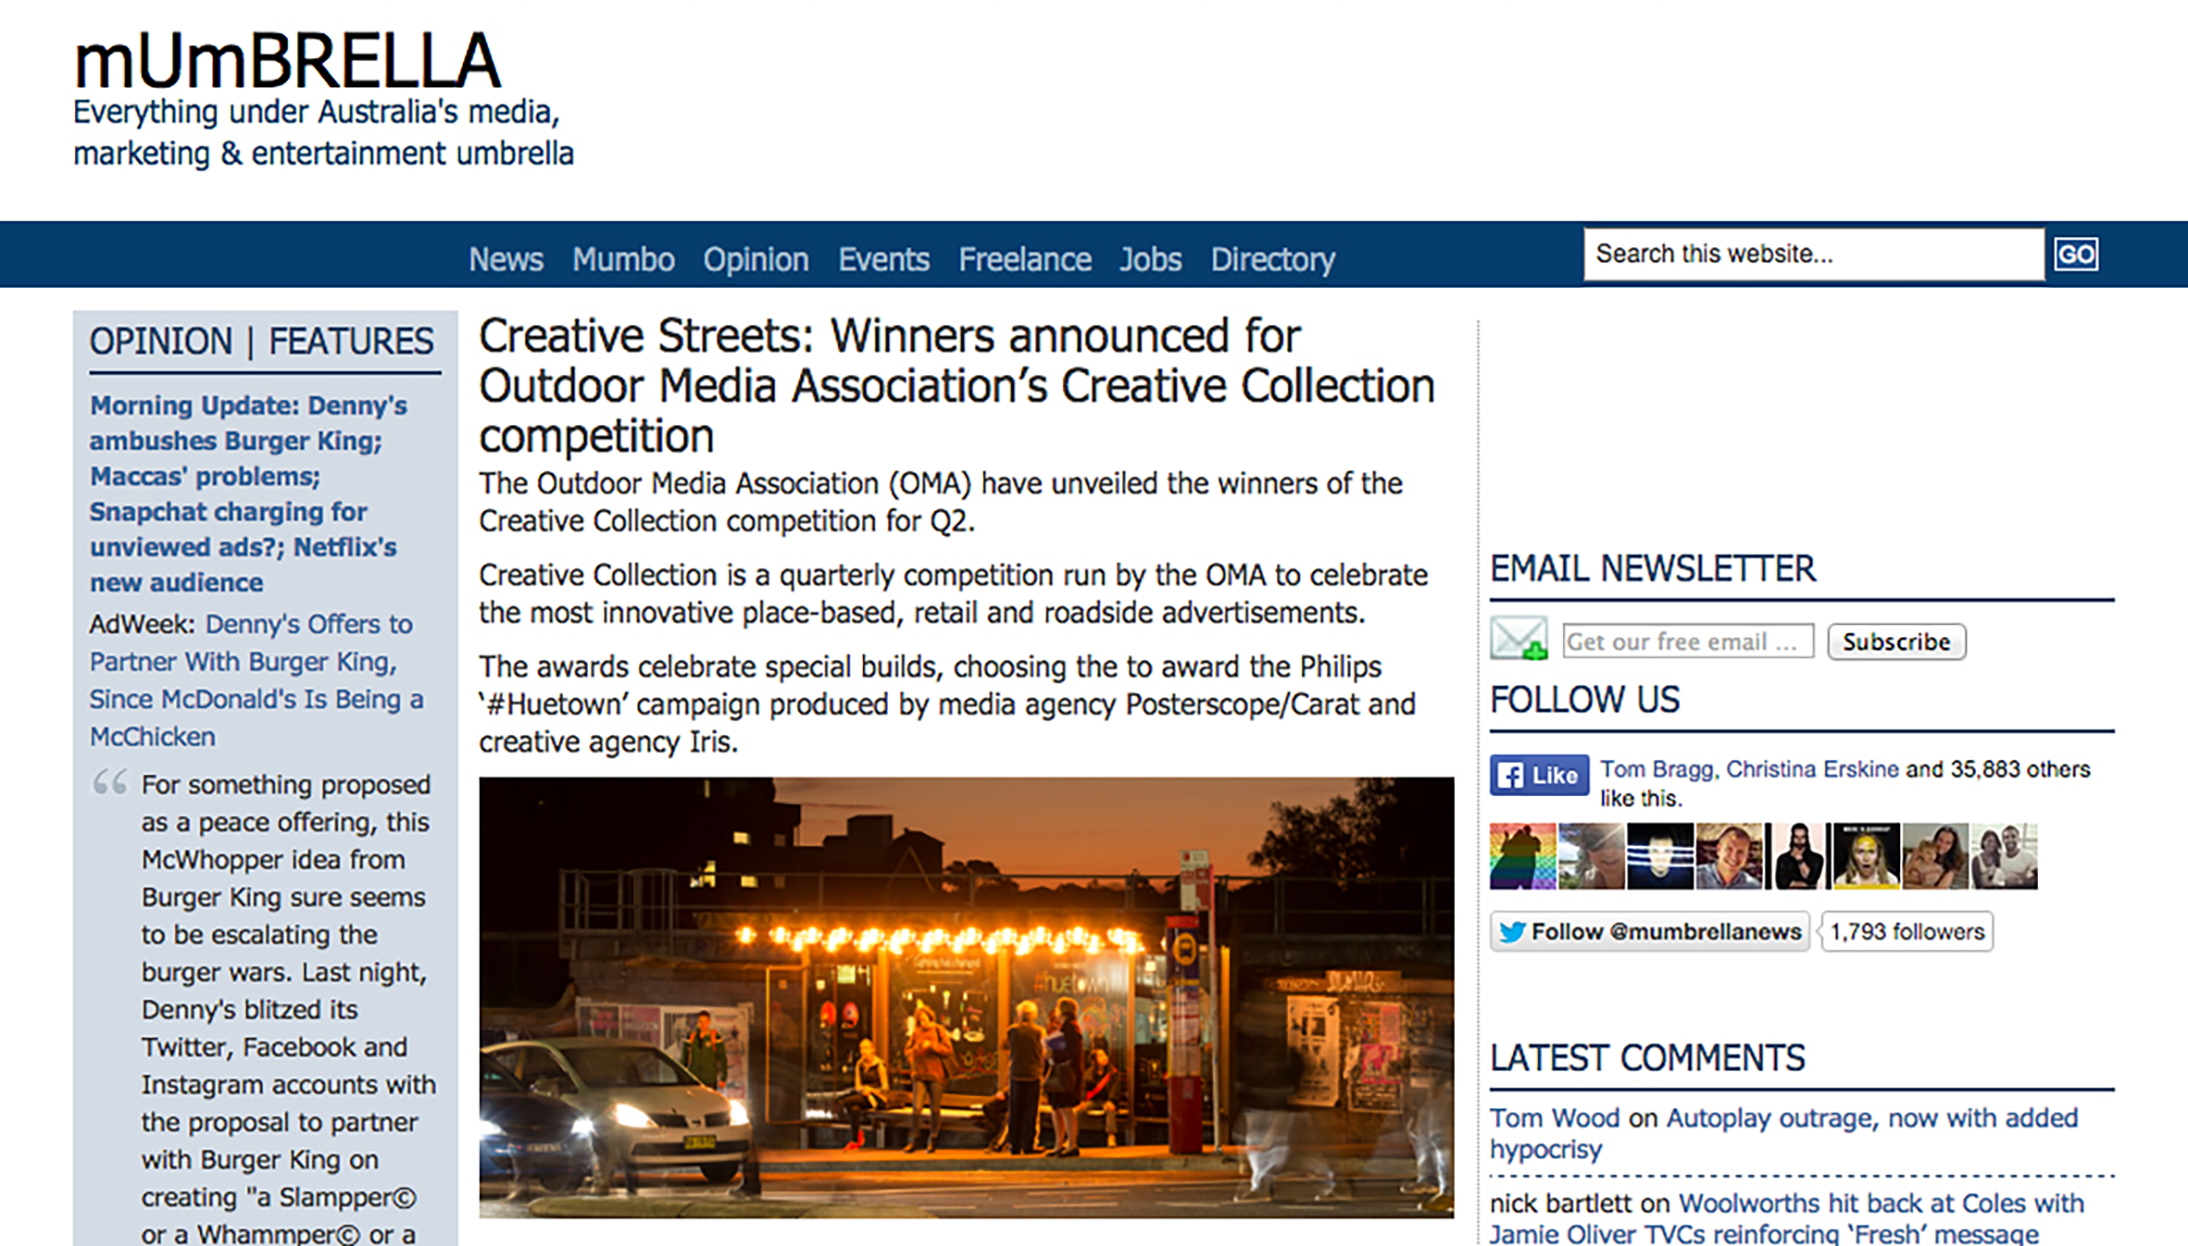 We won the Mumbrella Creative Streets award for Special Build